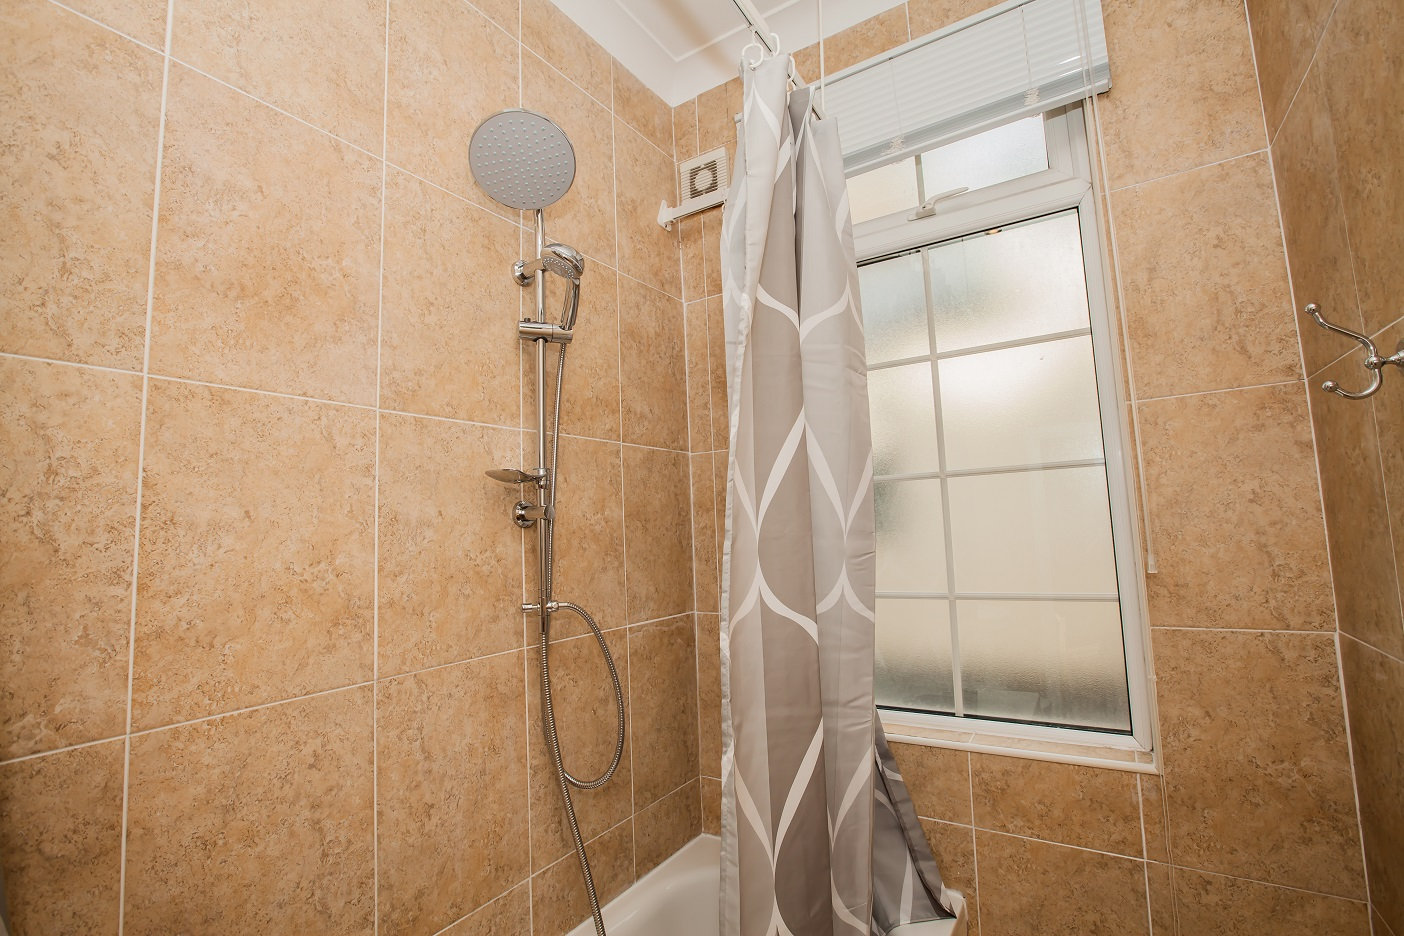 Shower/Bath at Marylebone Serviced Apartments, Marylebone, London - Citybase Apartments